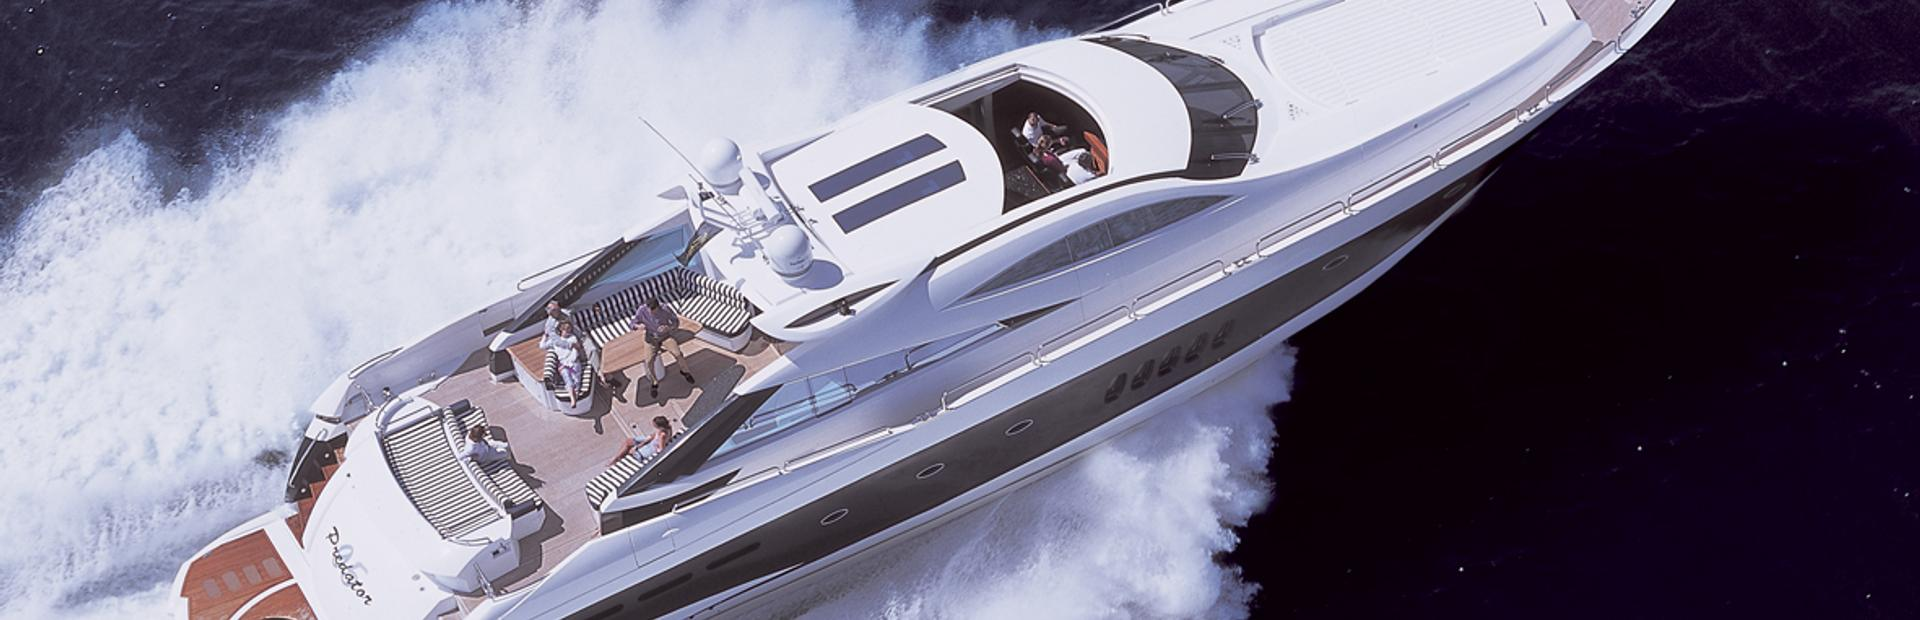 Predator 95 Yacht Charter